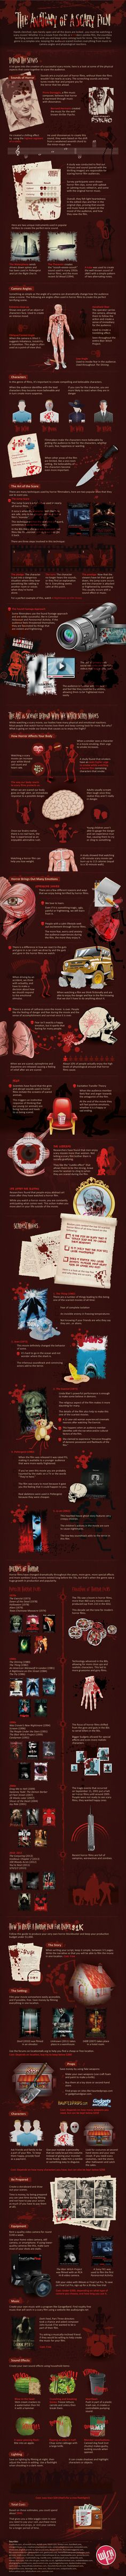 Anatomy of a scary movie.